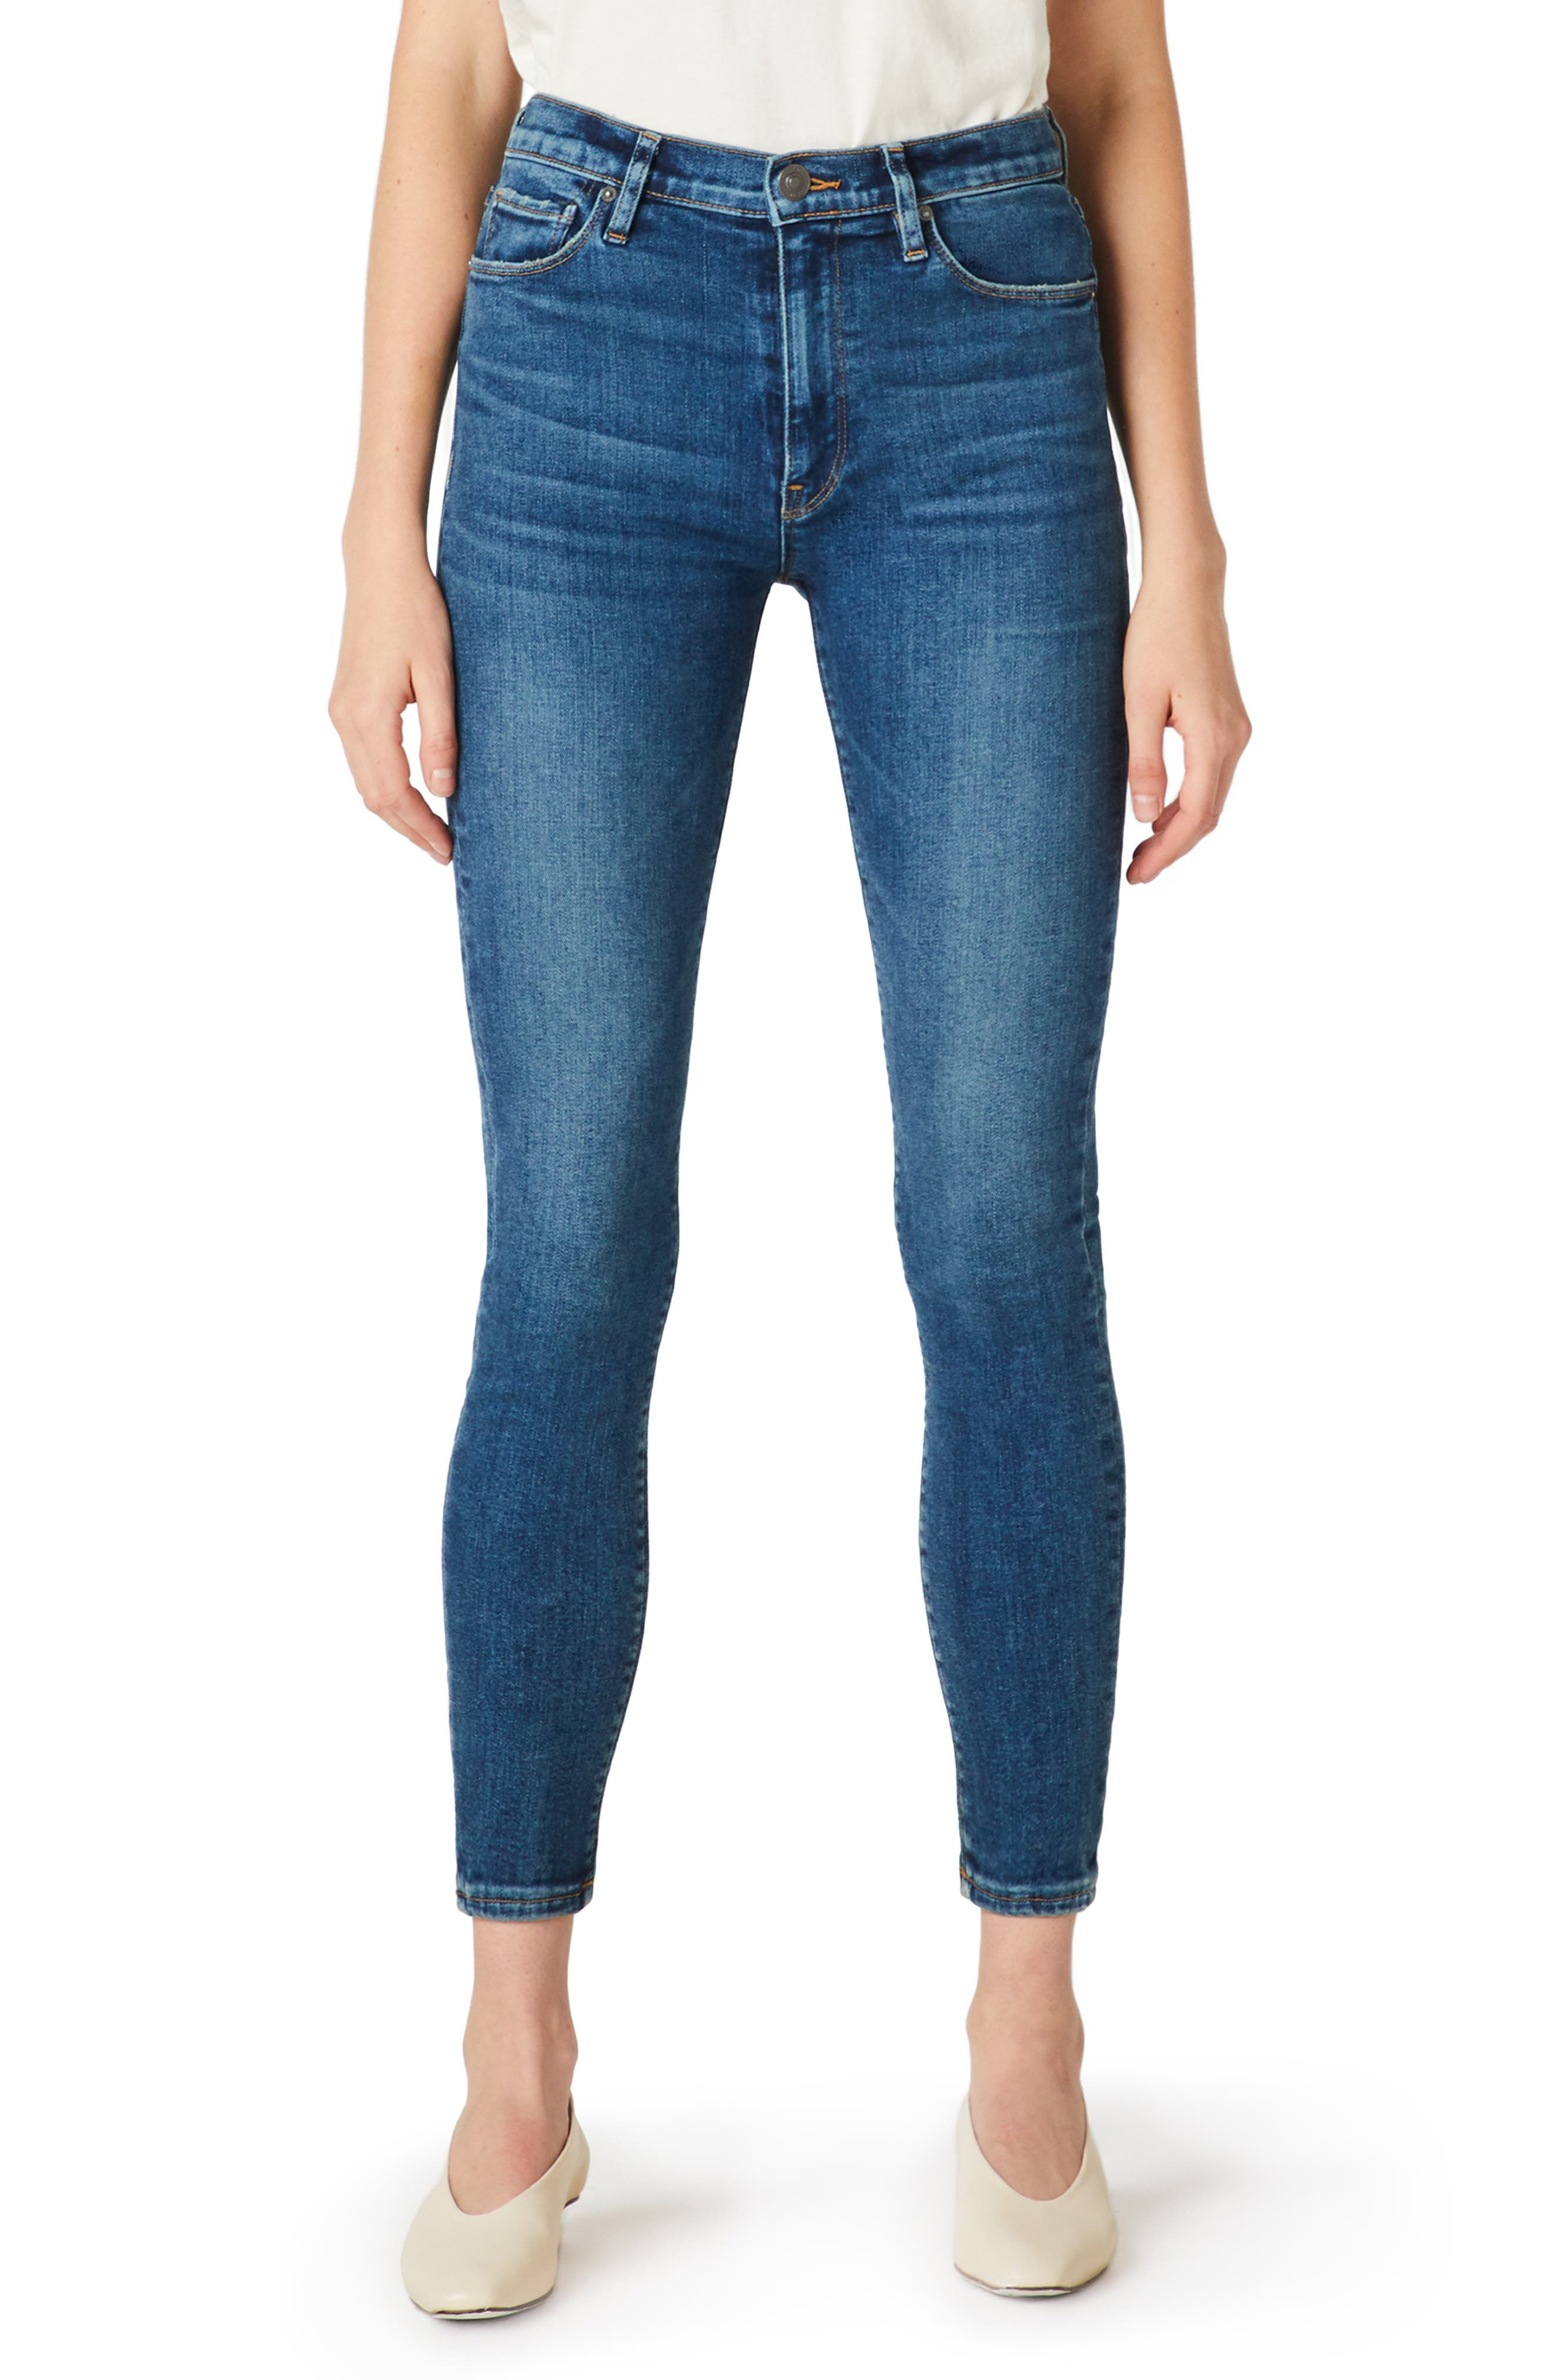 Barbara High Waist Ankle Skinny Jeans